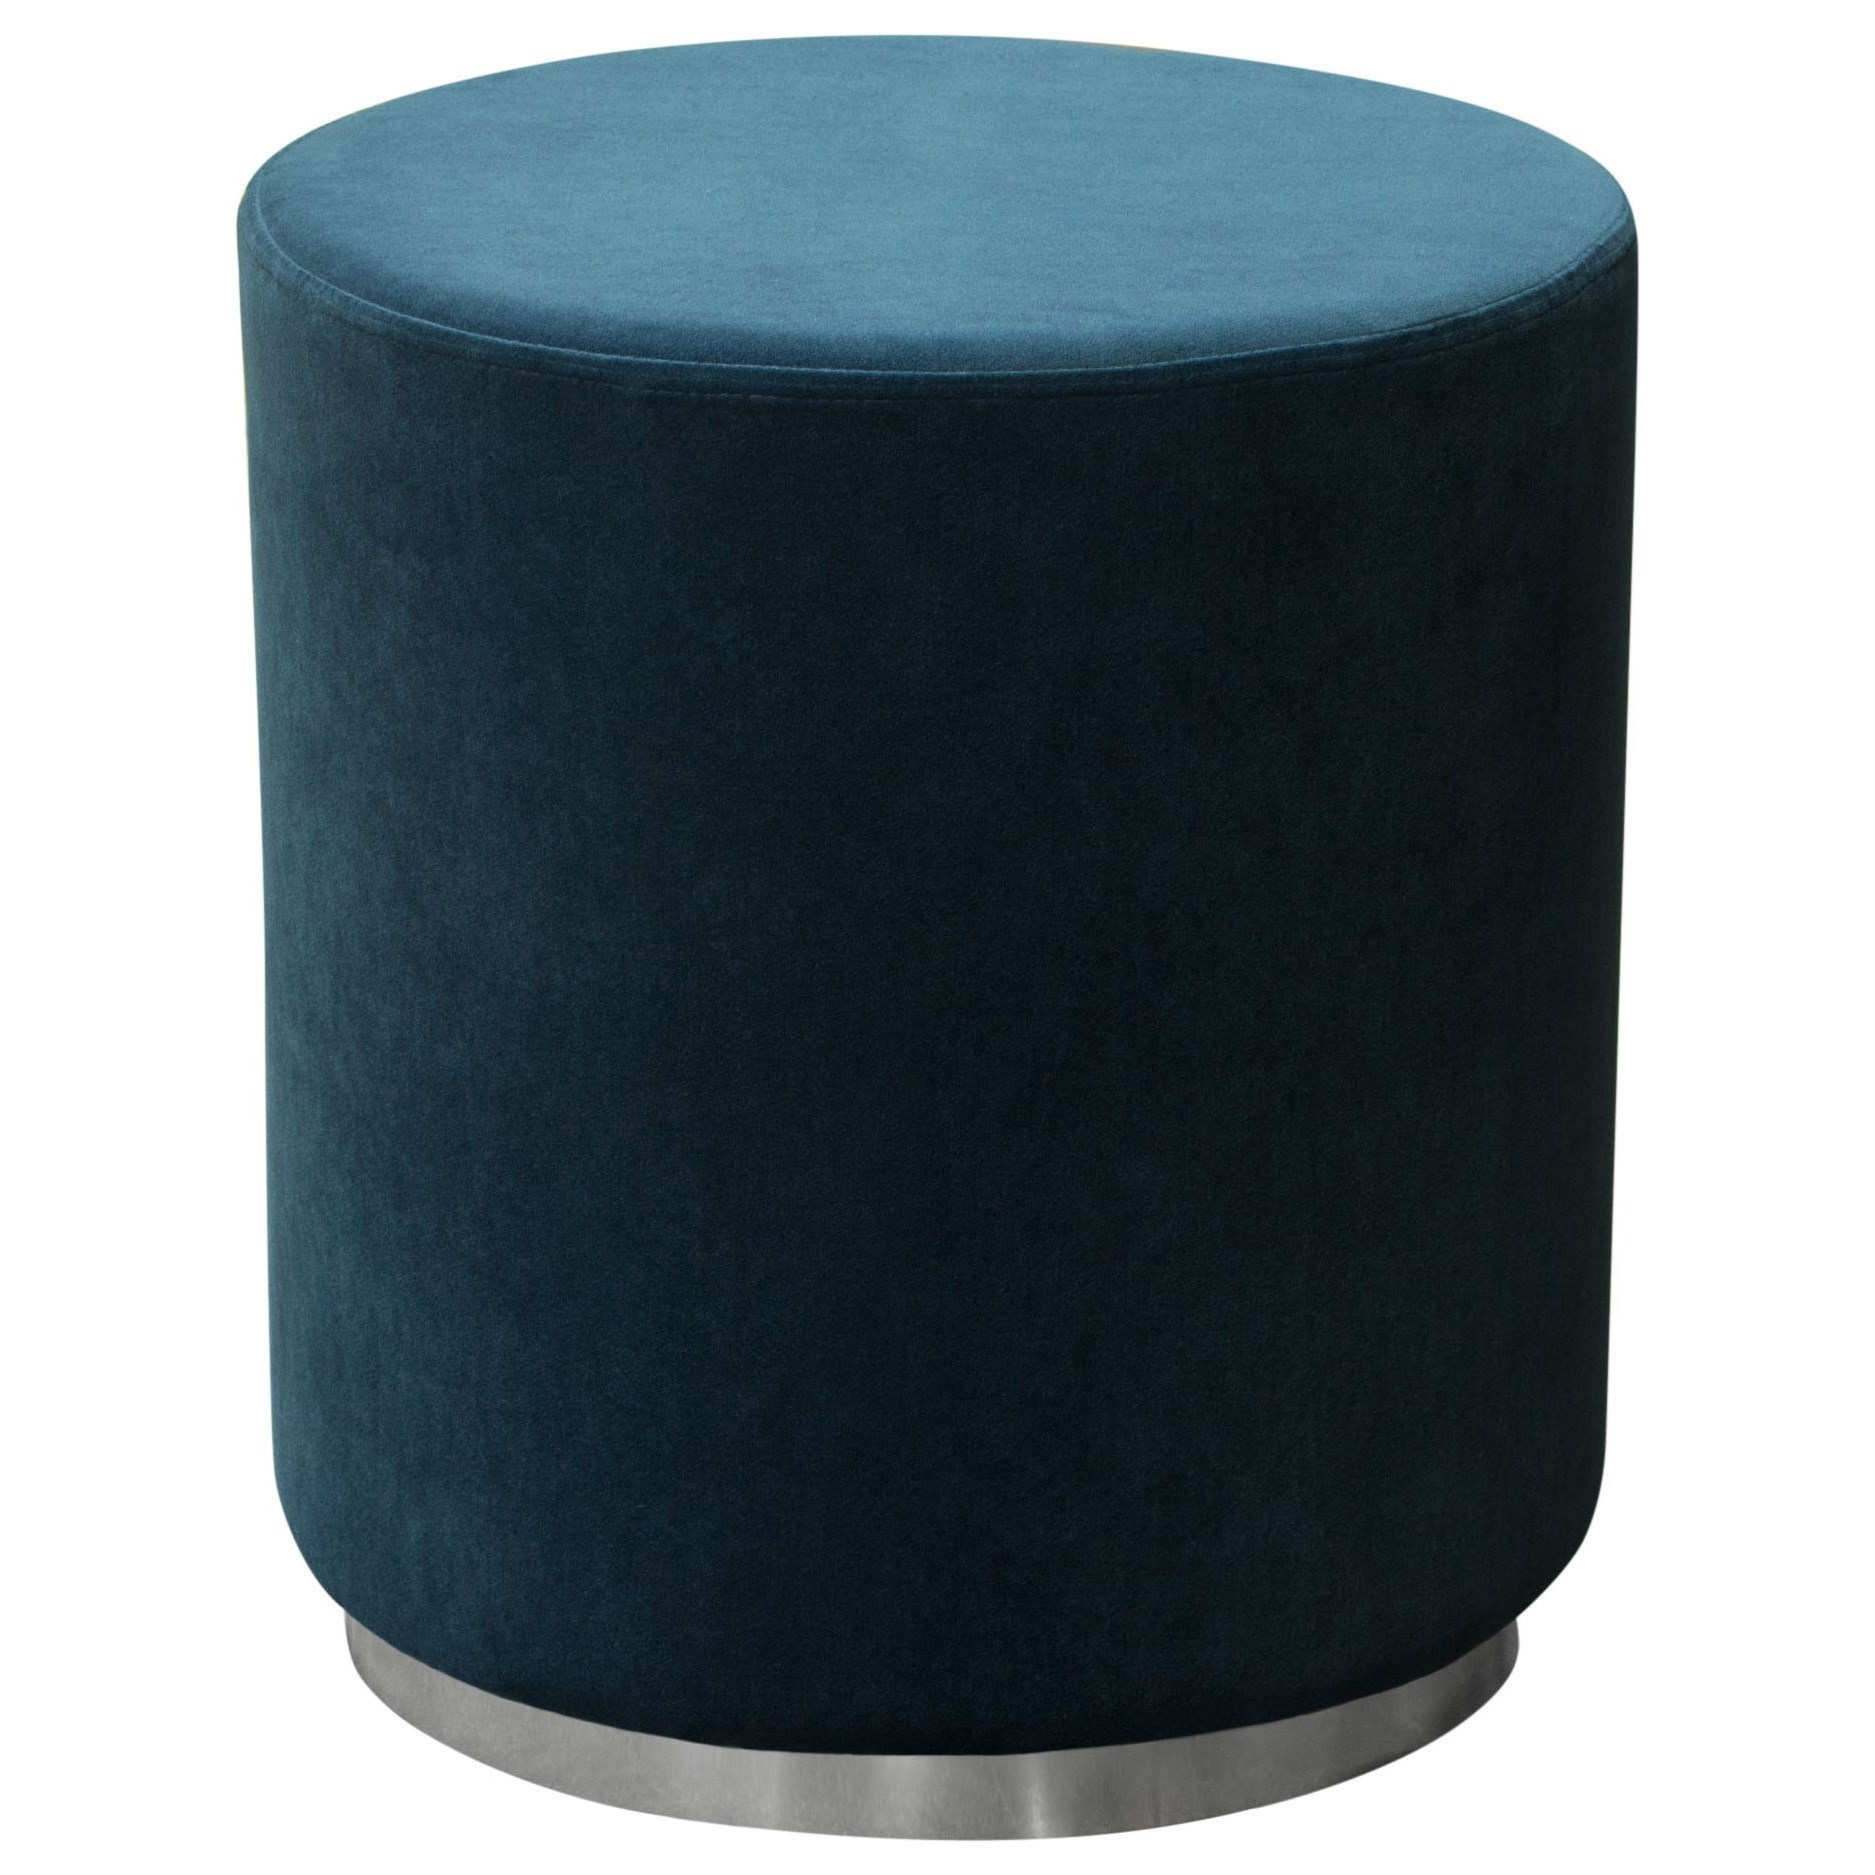 Sorbet Accent Ottoman by Diamond Sofa at HomeWorld Furniture